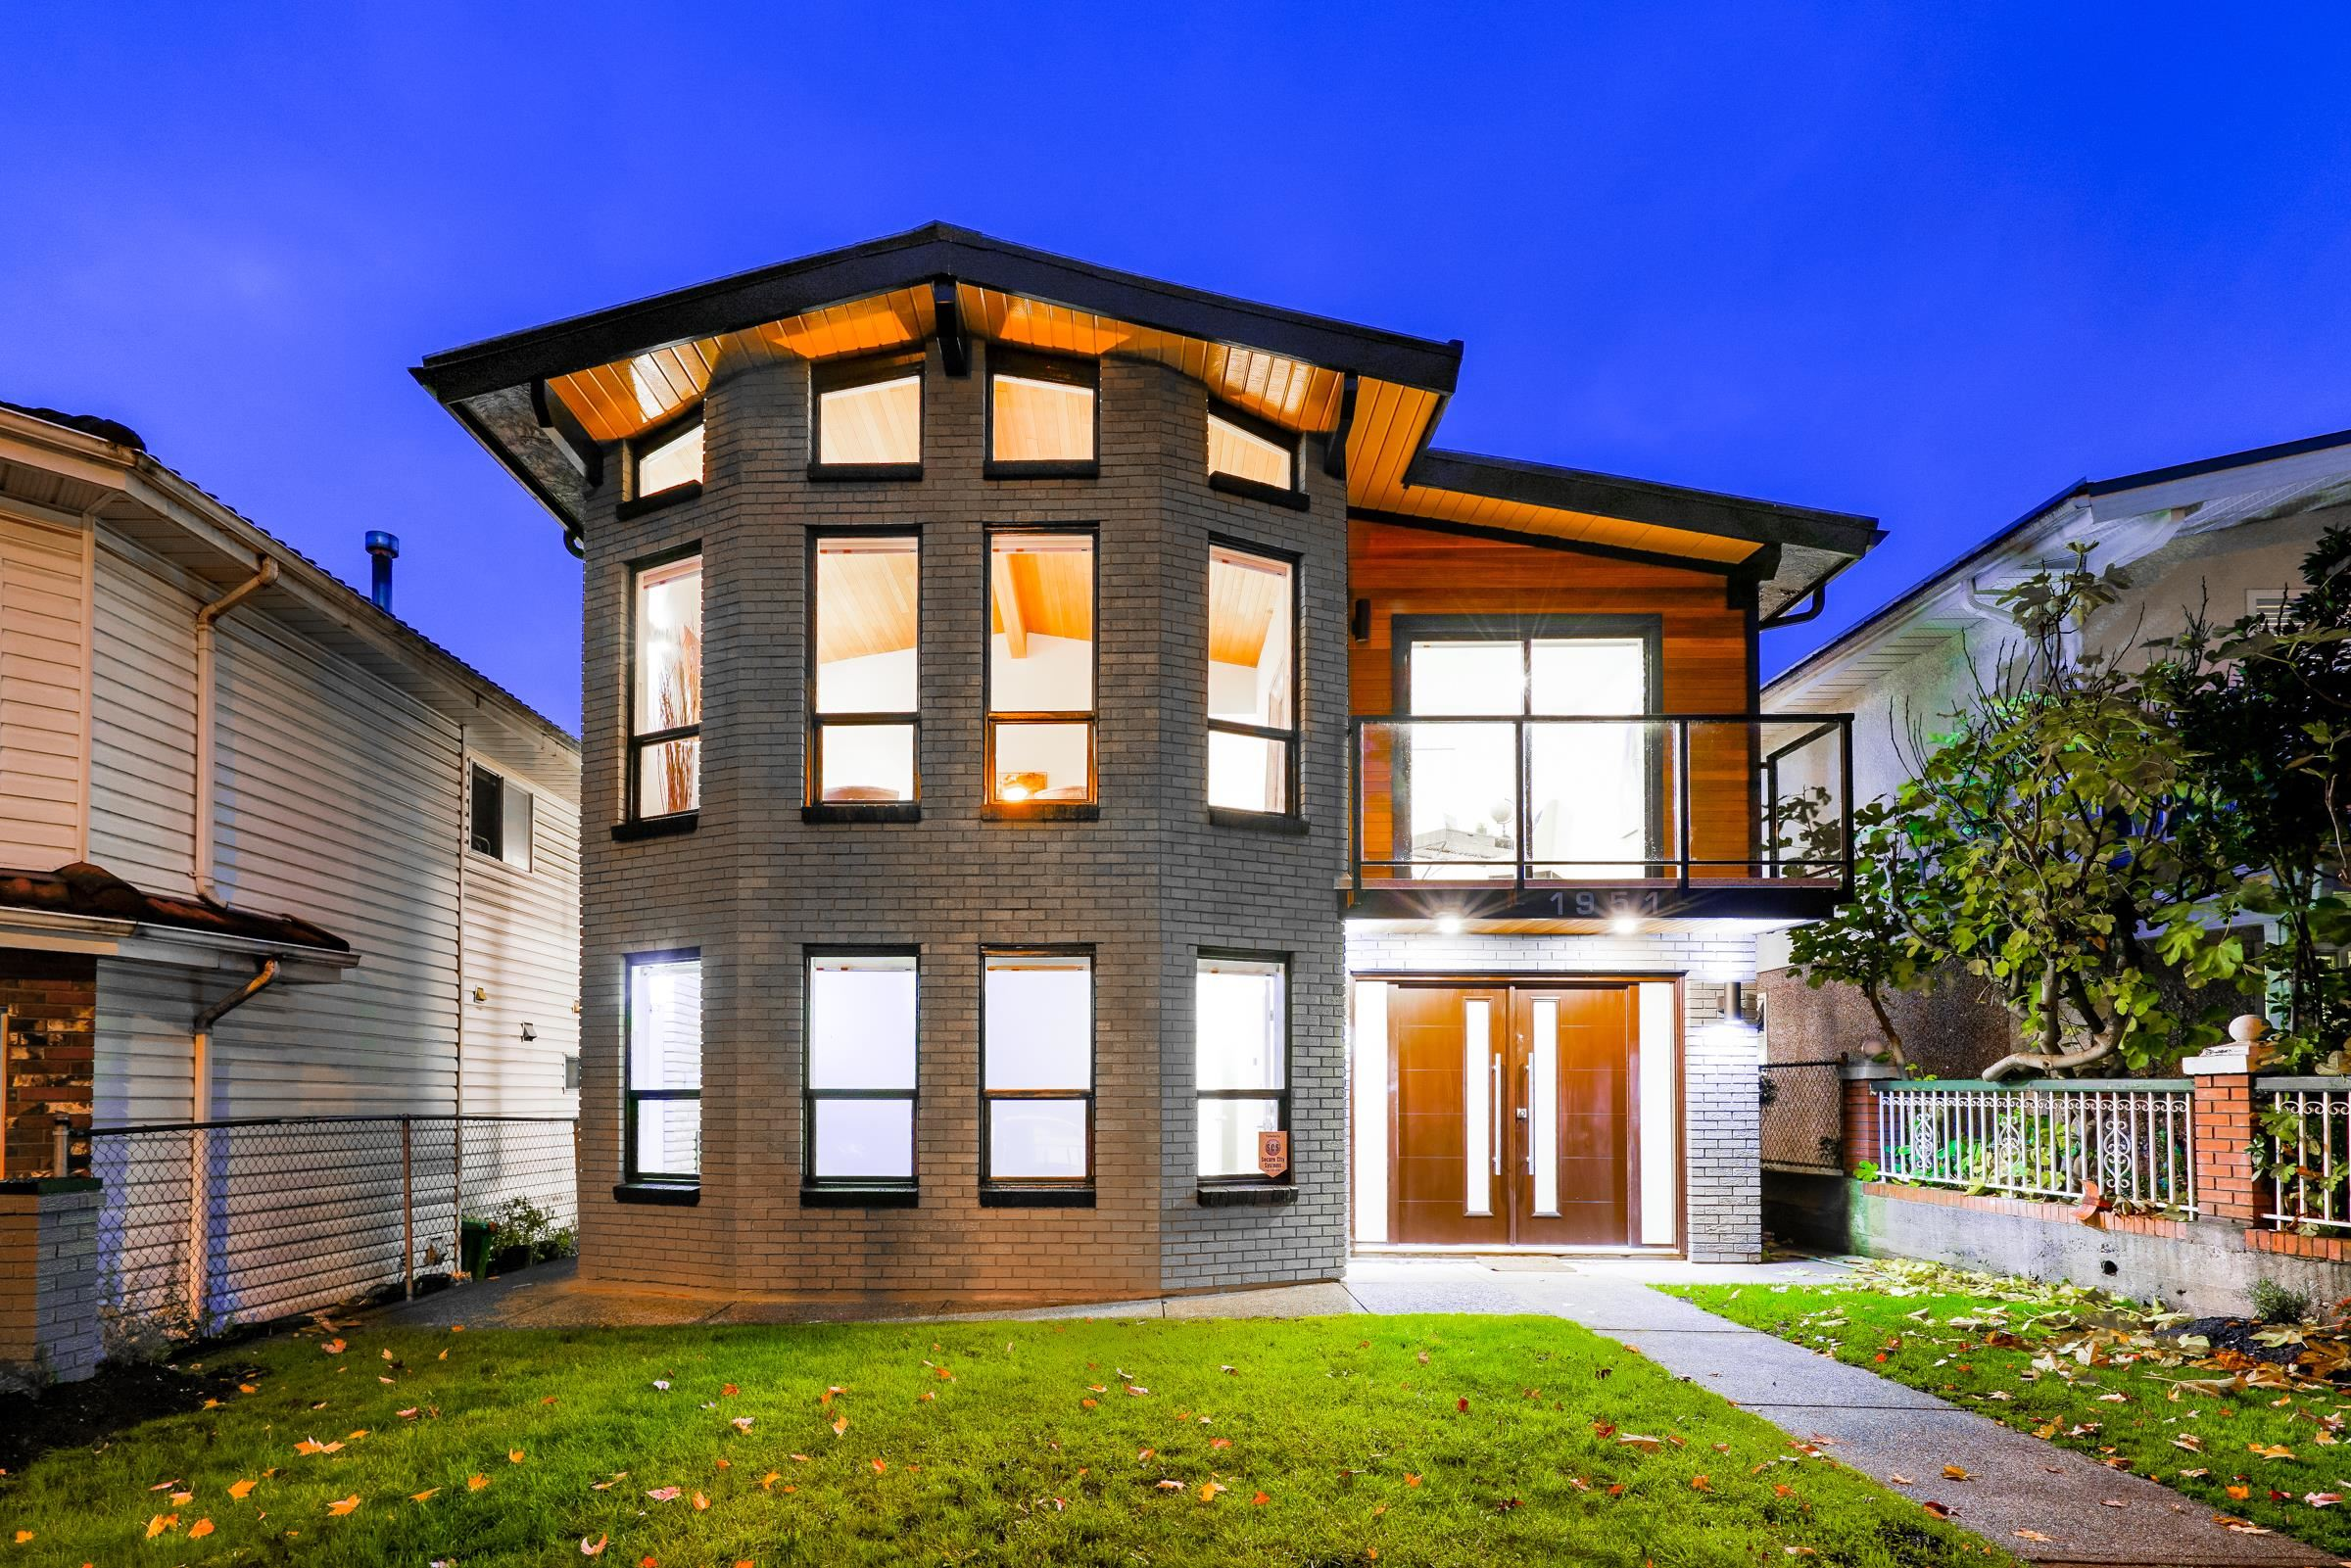 1951 E 35TH AVENUE - Victoria VE House/Single Family for sale, 6 Bedrooms (R2616922) - #1